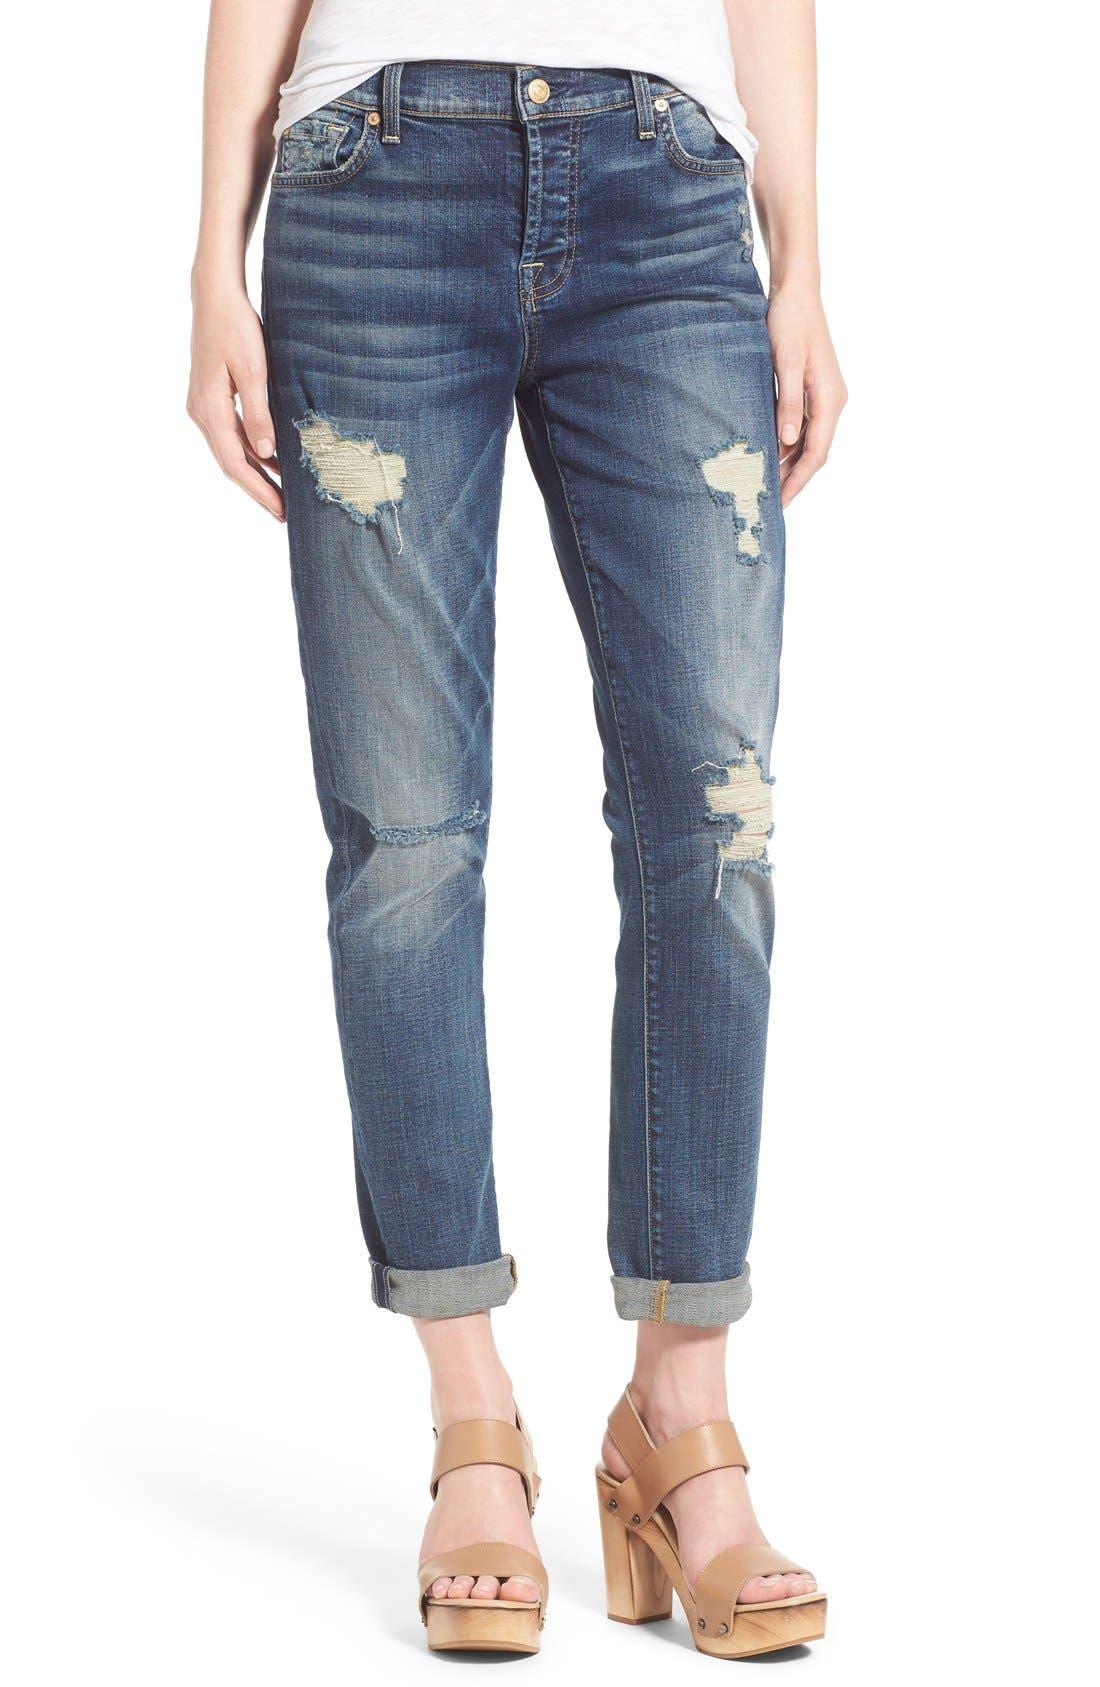 Alternate Image 1 Selected - 7 For All Mankind® 'Josephina' Distressed Boyfriend Jeans (Crete Island)